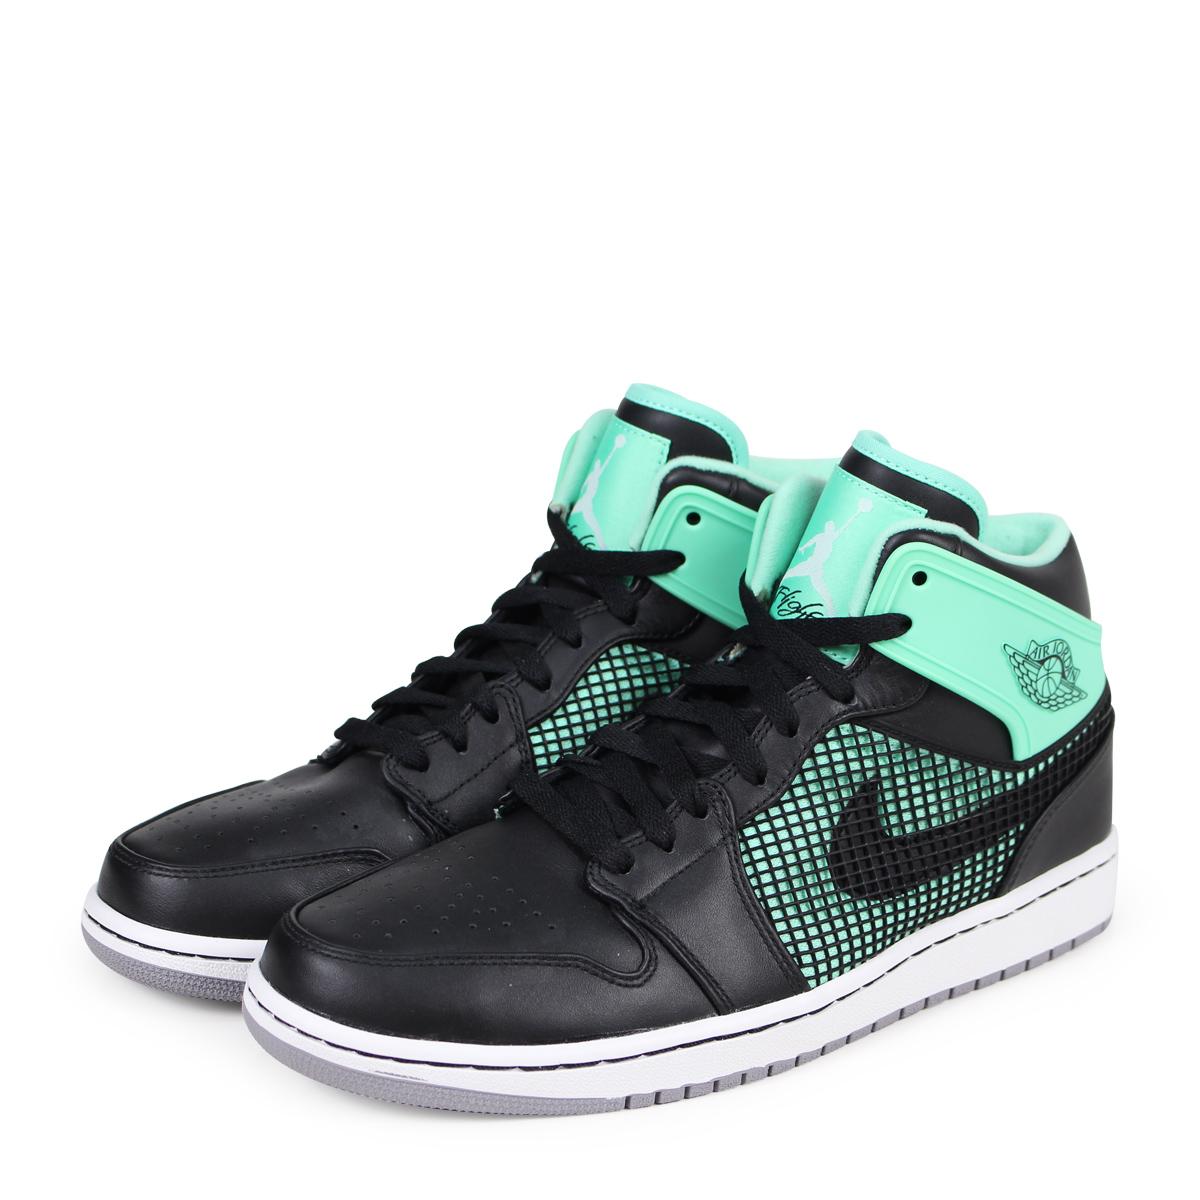 new arrival 4e0ce 8ccea NIKE AIR JORDAN 1 RETRO 89 Nike Air Jordan 1 nostalgic sneakers men 599,873- 033 ...